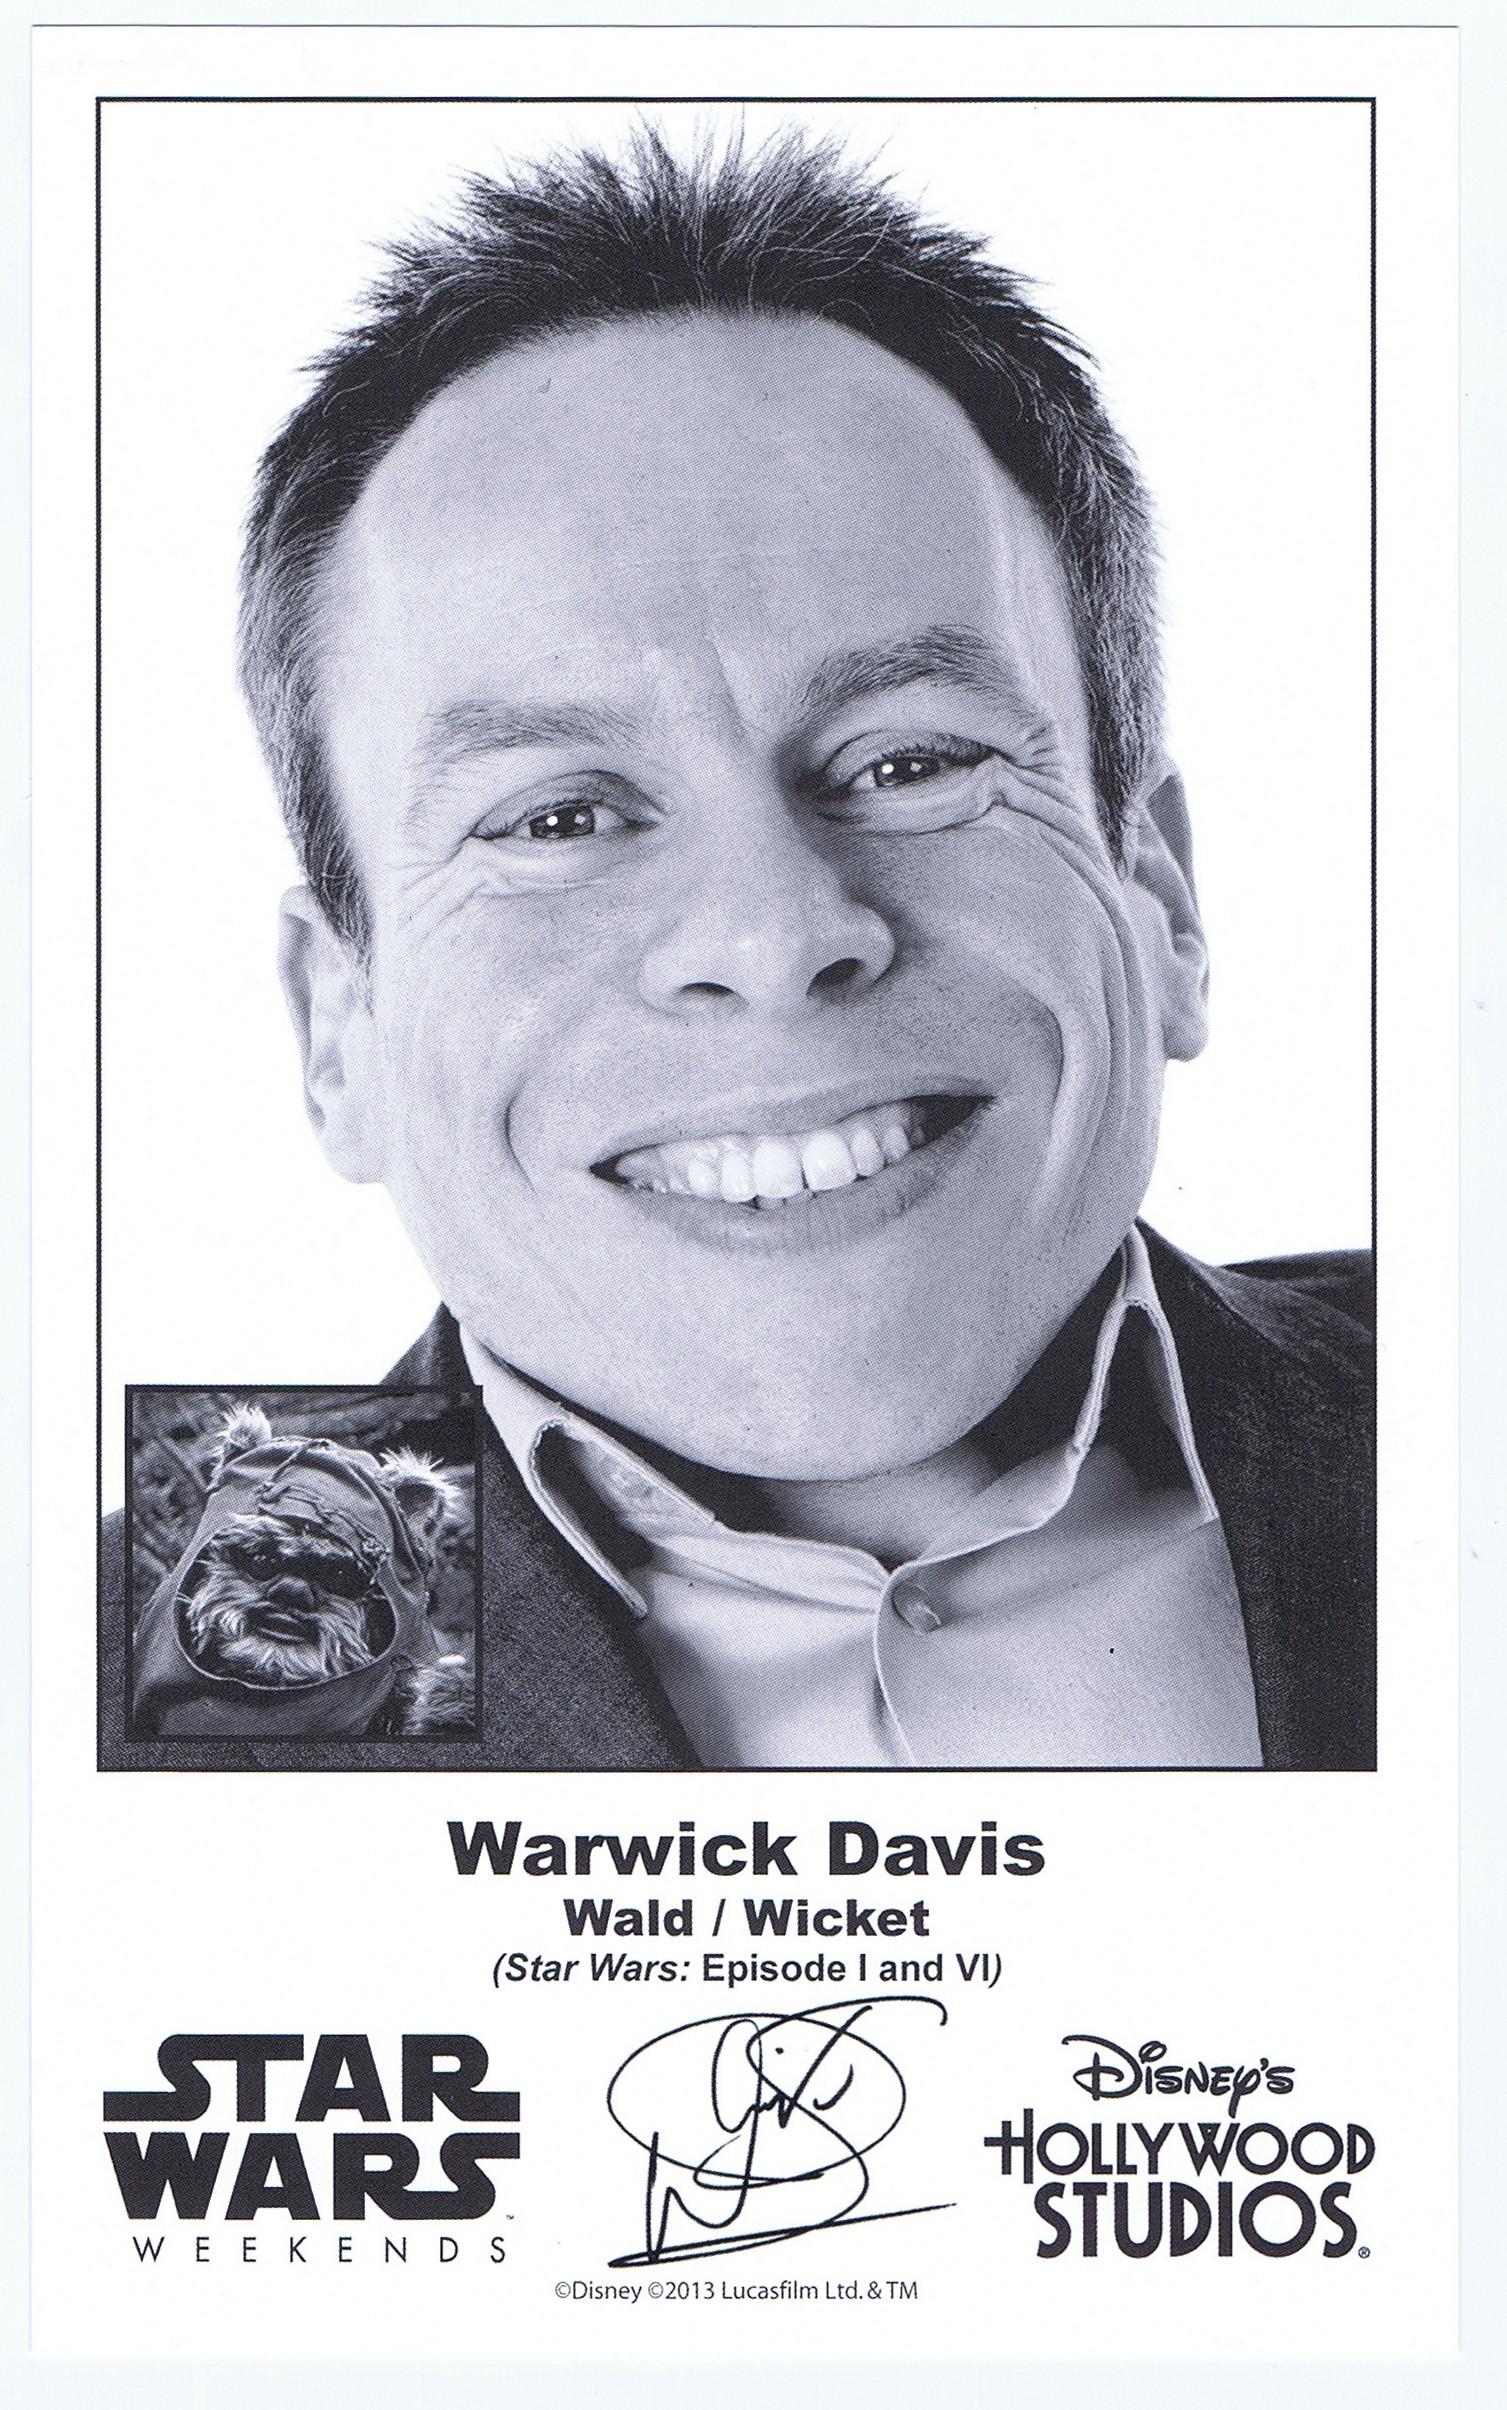 Warwick Davis who played The Ewok Wicket W. Warrick Presigned Official Star Wars Weekends 2013 Celebrity Collector Photo © Dizdude.com